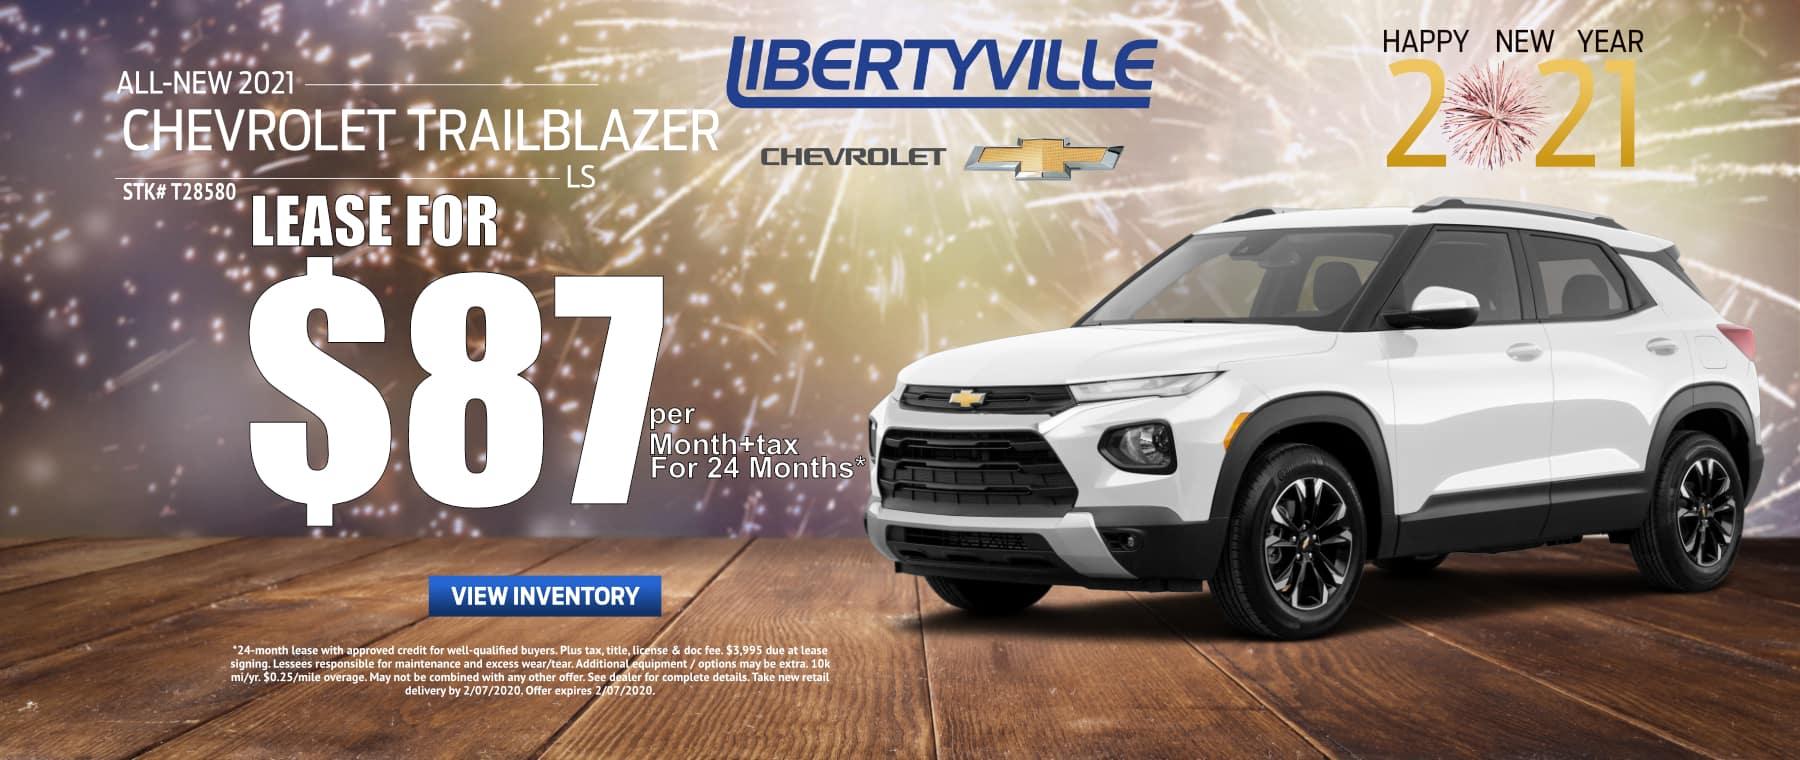 January-2021_Trailblazer_LS_Lease_Libertyville